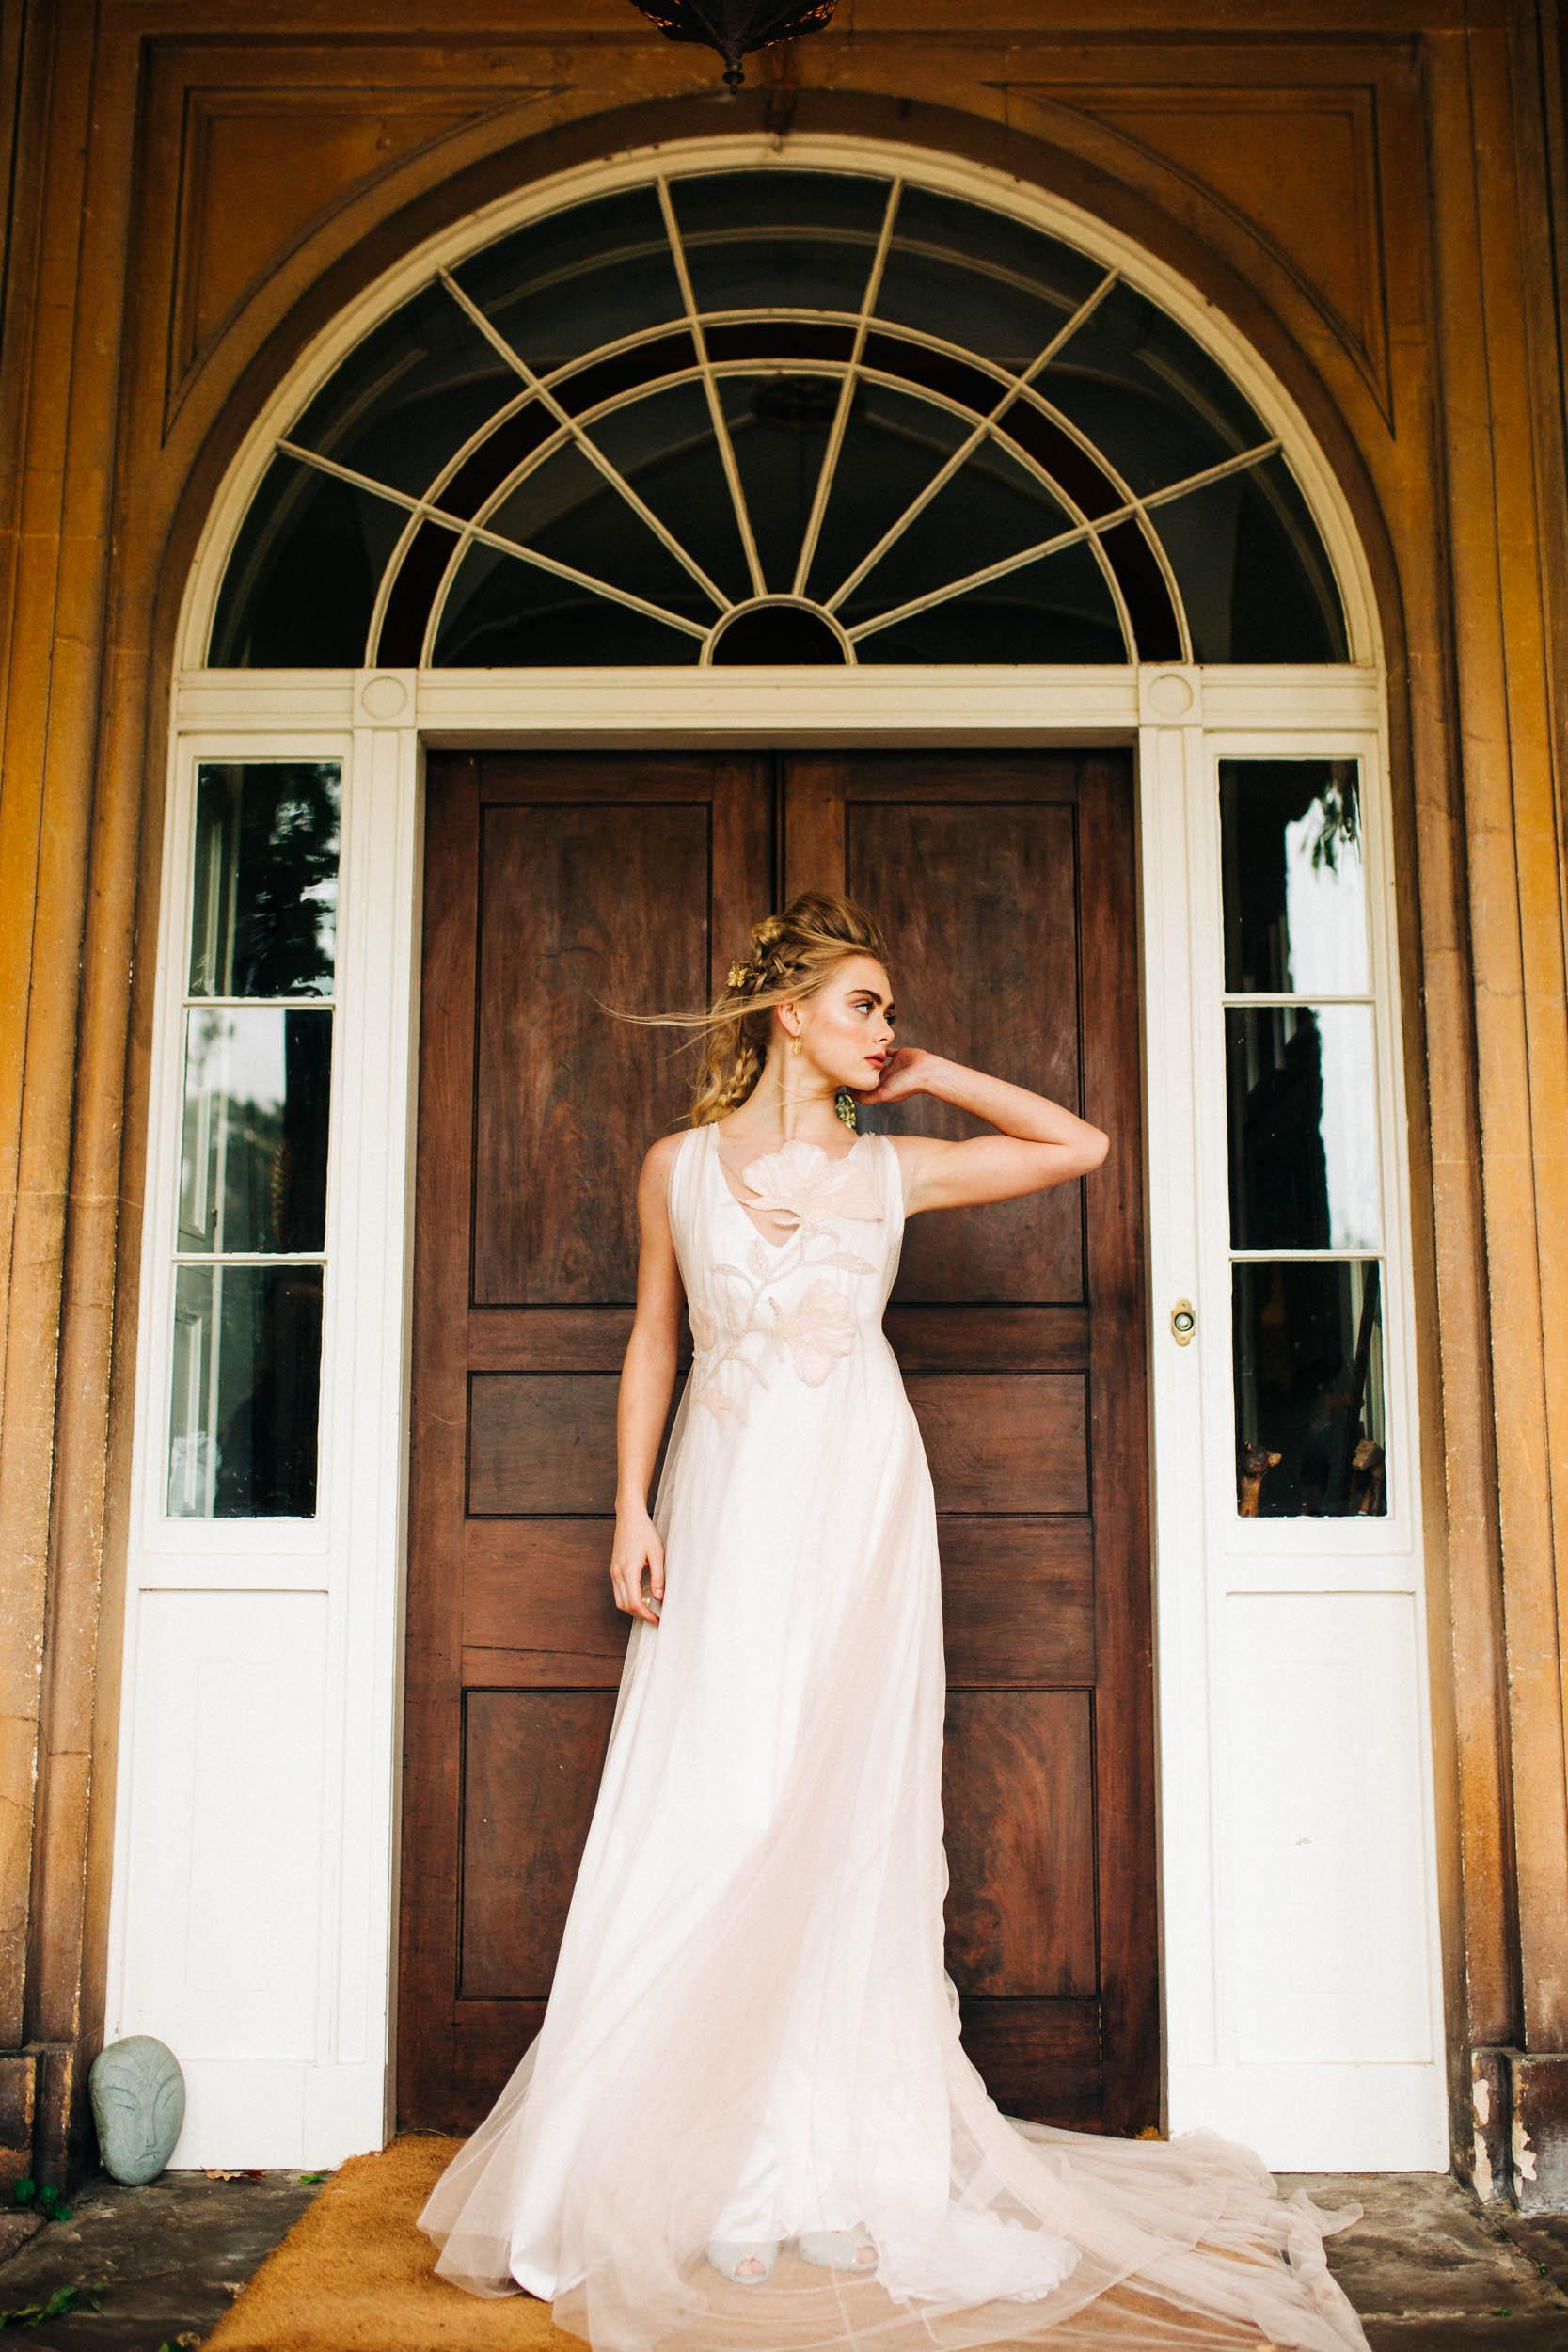 Alex_Sedgmond_Photography-SouthWalesWeddingPhotography-Wedding-Photographer-Cardiff-254.jpg